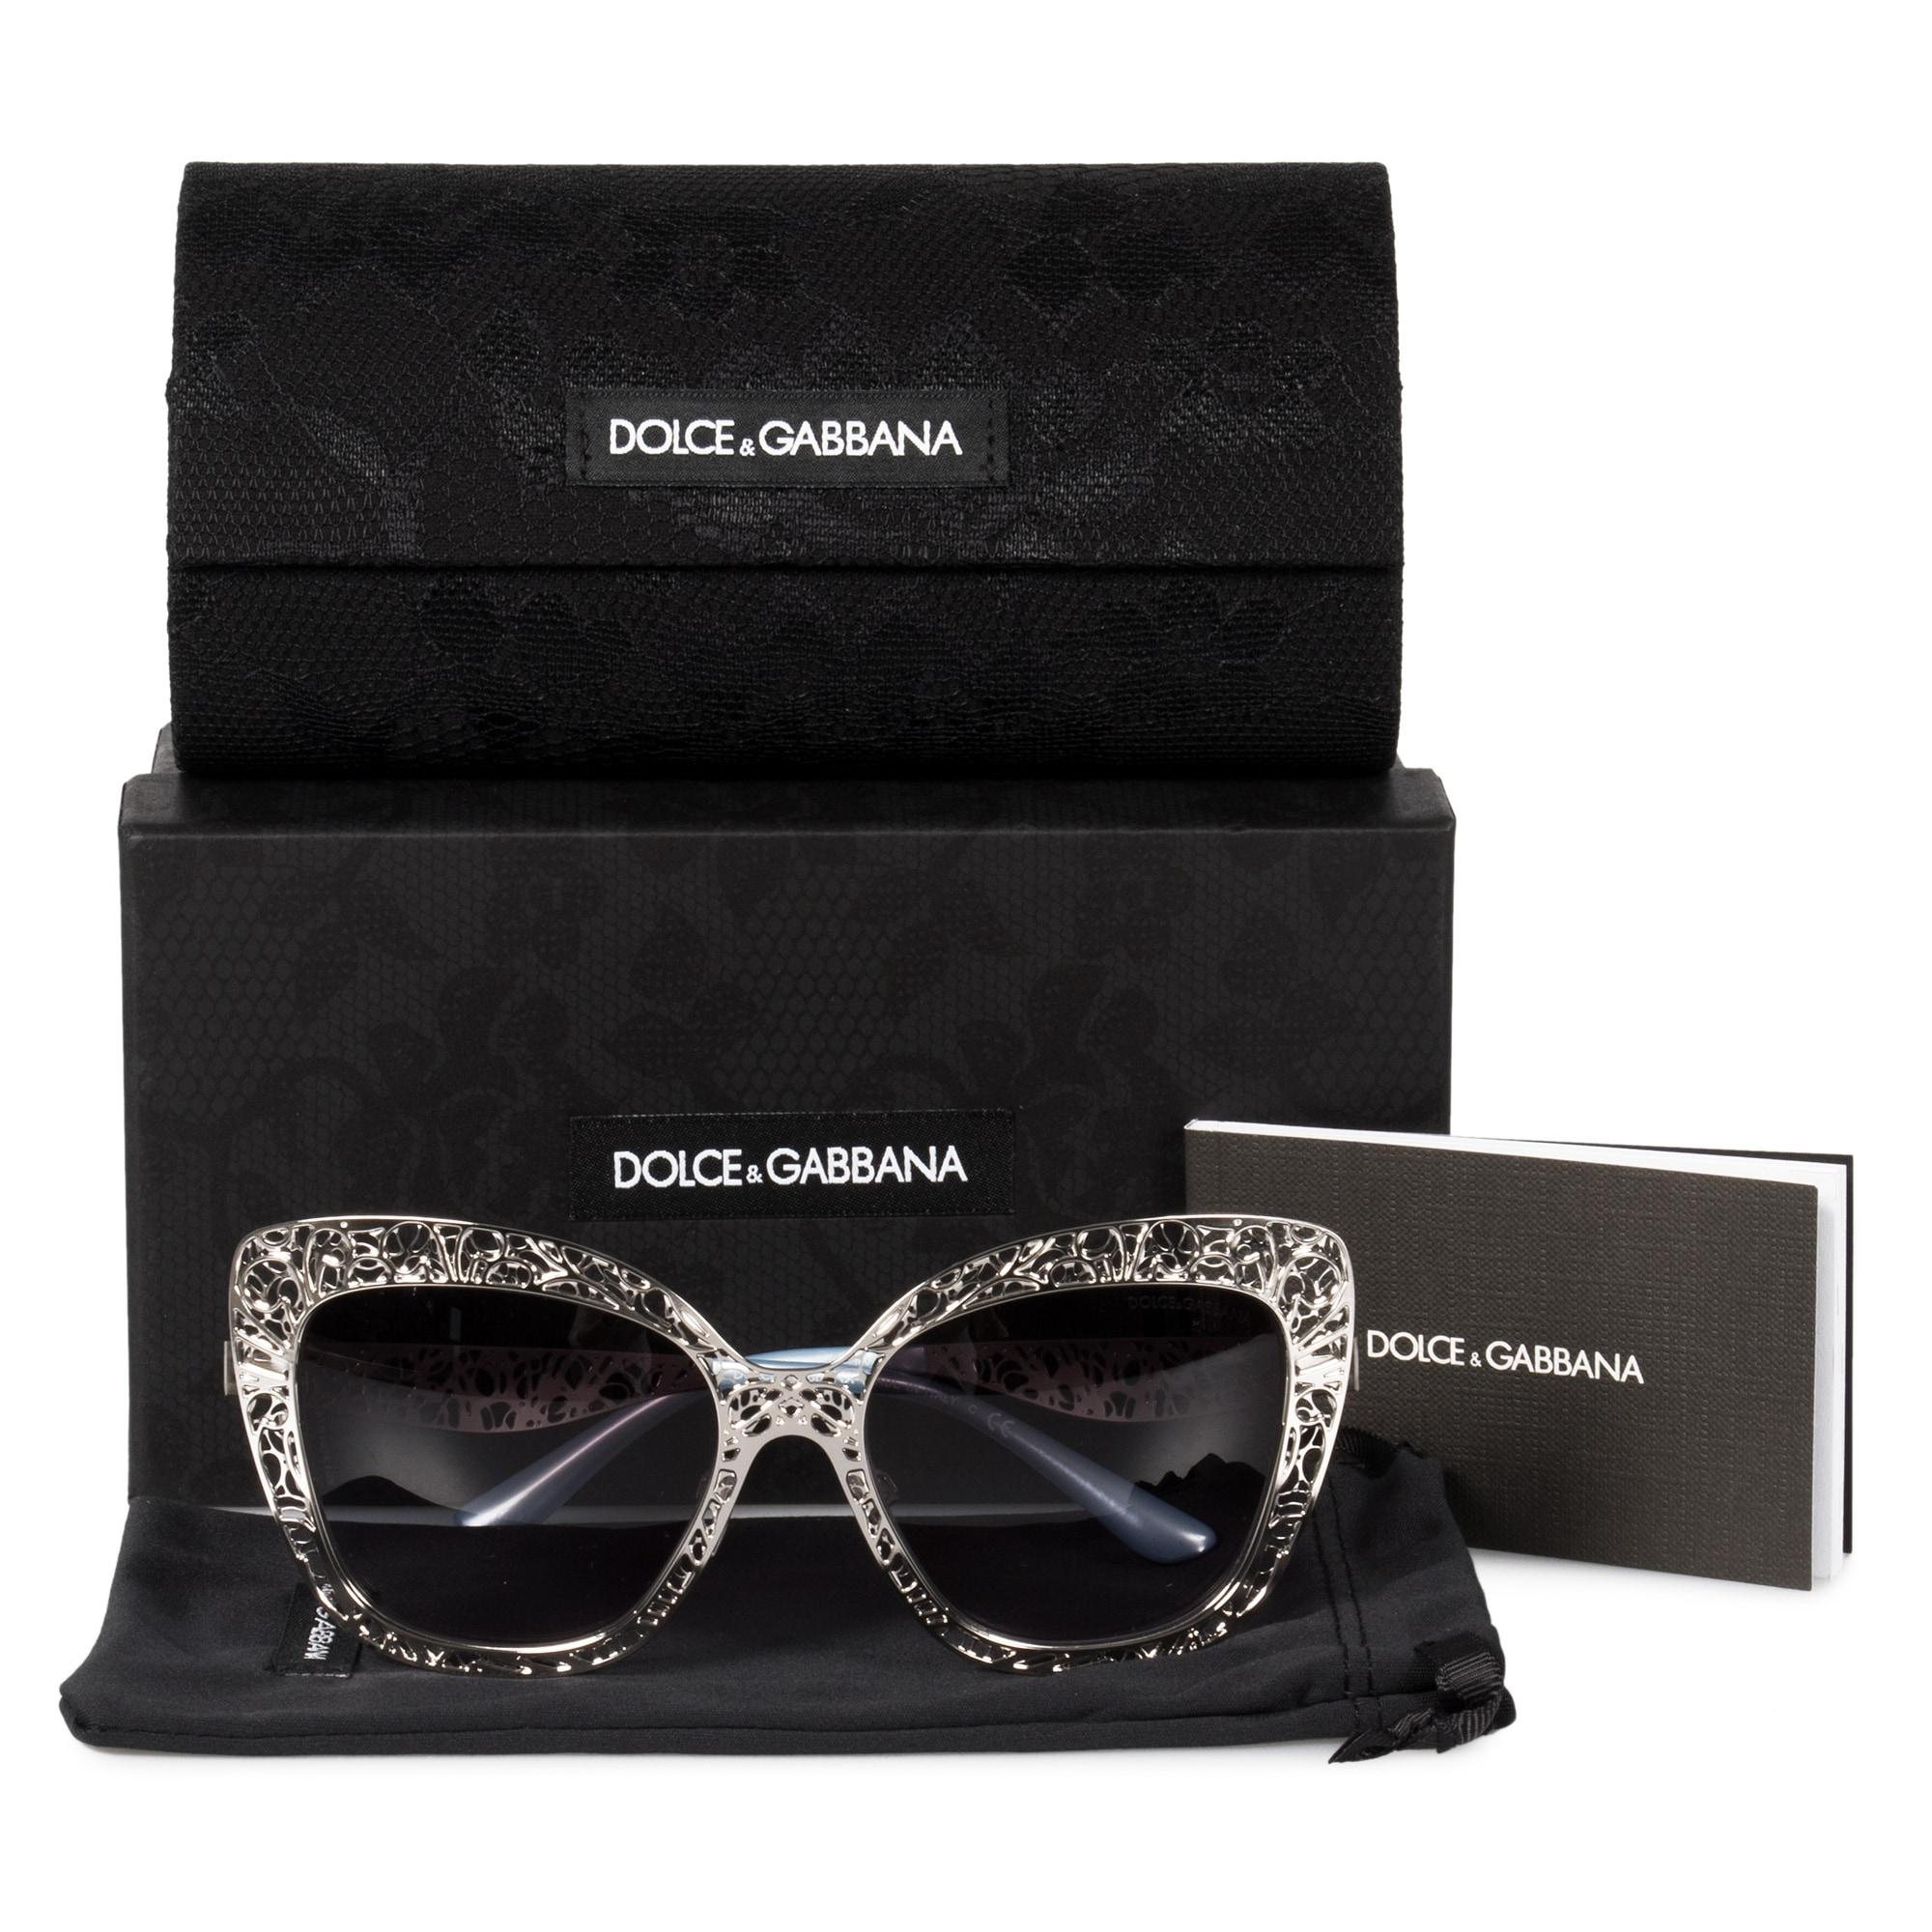 da4790e6fa56 Shop Dolce & Gabbana Butterfly Sunglasses DG2164 05/8G 56 - Free Shipping  Today - Overstock - 23138809